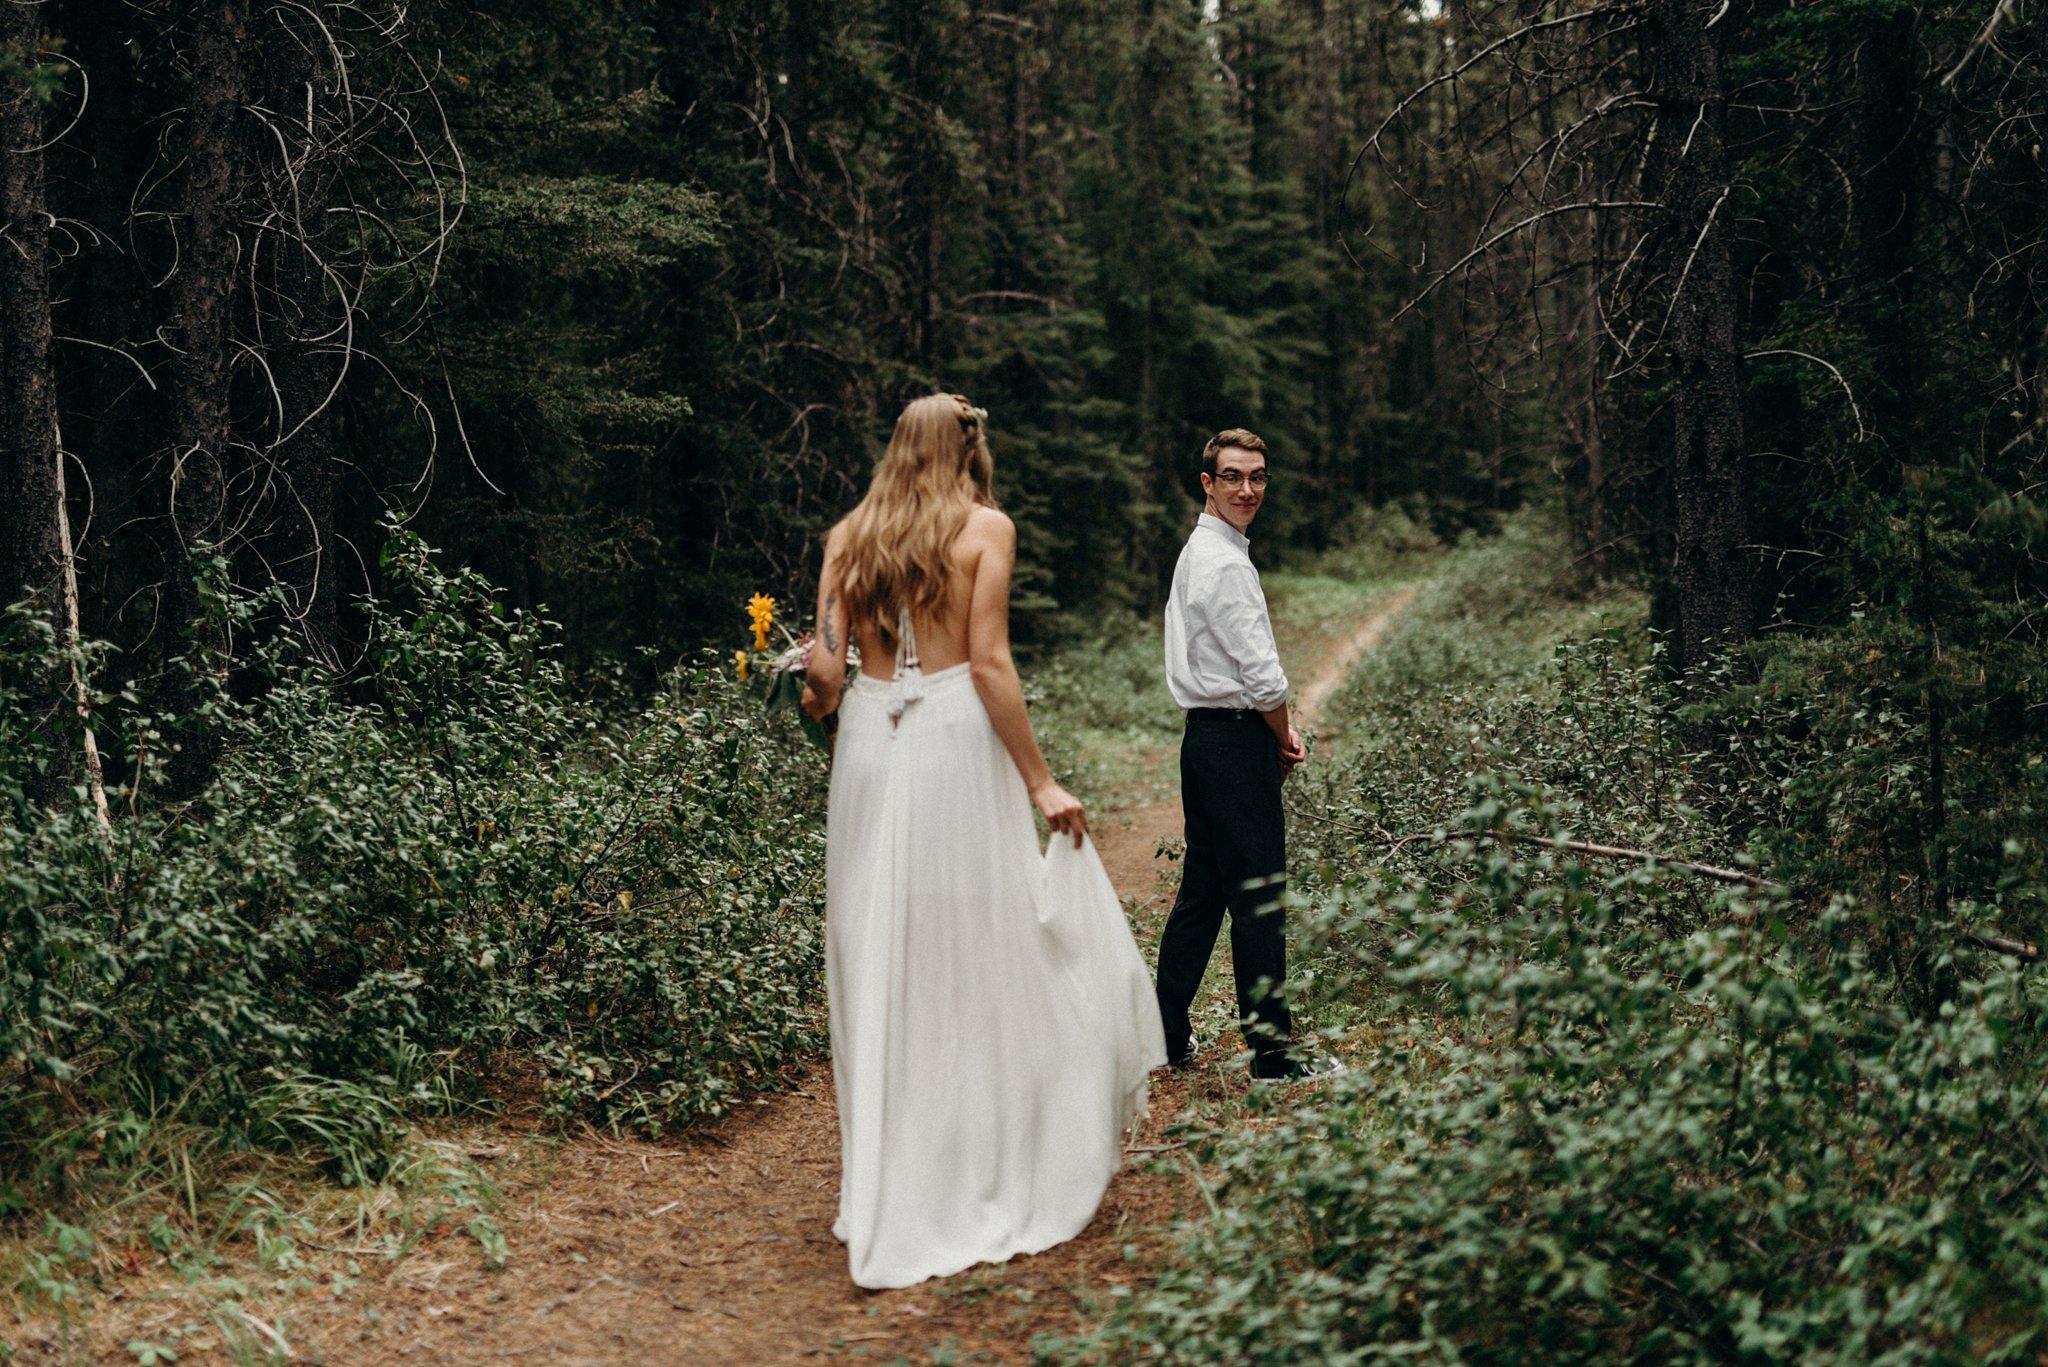 kaihla_tonai_intimate_wedding_elopement_photographer_6361.jpg